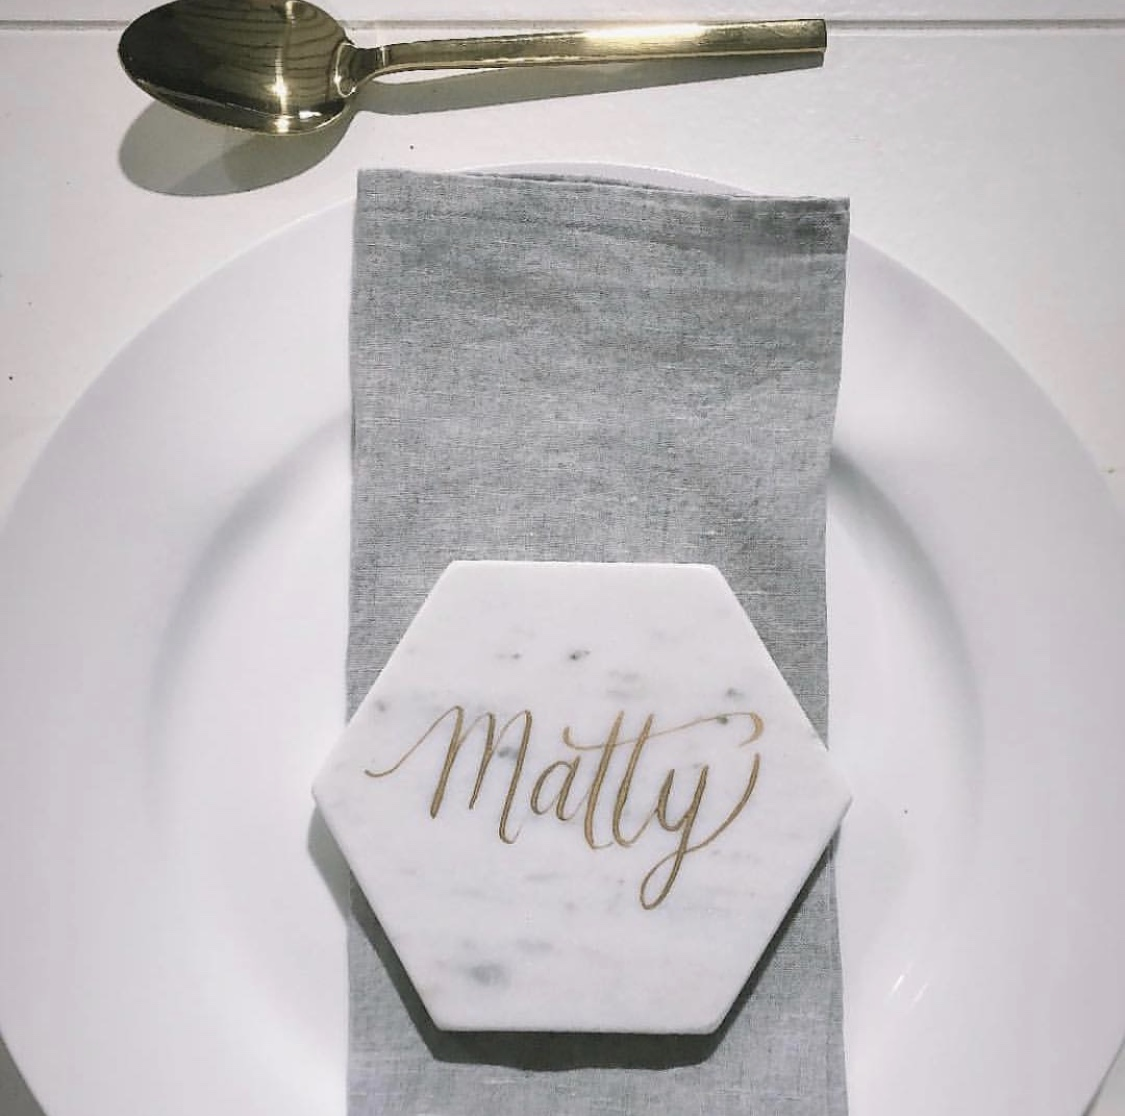 SIlver Grey Napkin, image via Matilda Rice